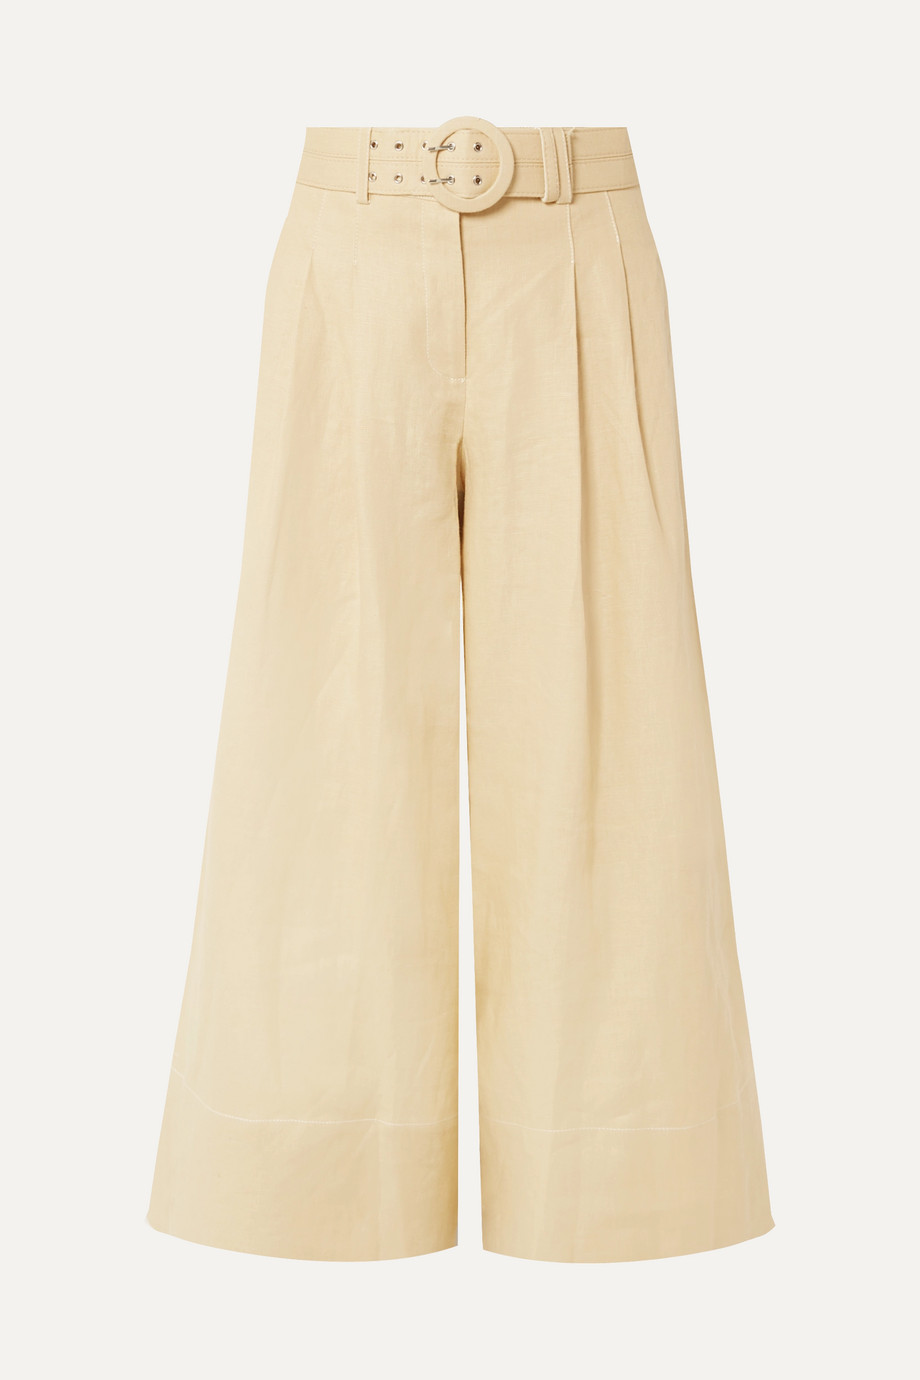 NICHOLAS Jupe-culotte raccourcie en lin à ceinture